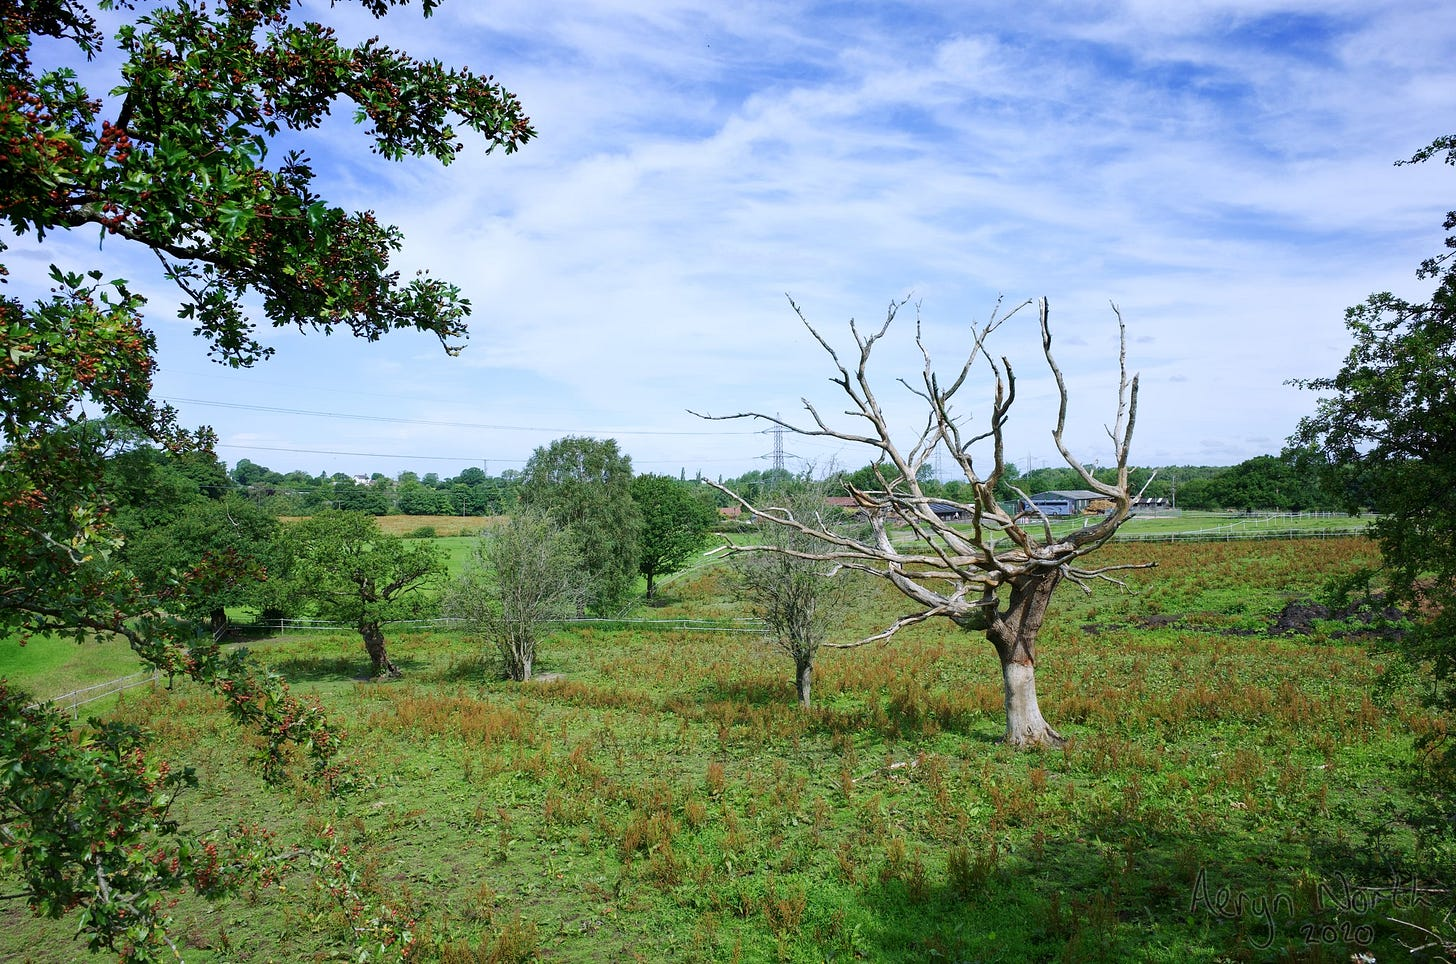 20200712-1024-01-dead-tree-macclesfield-canal-by-Aeryn-North.jpg